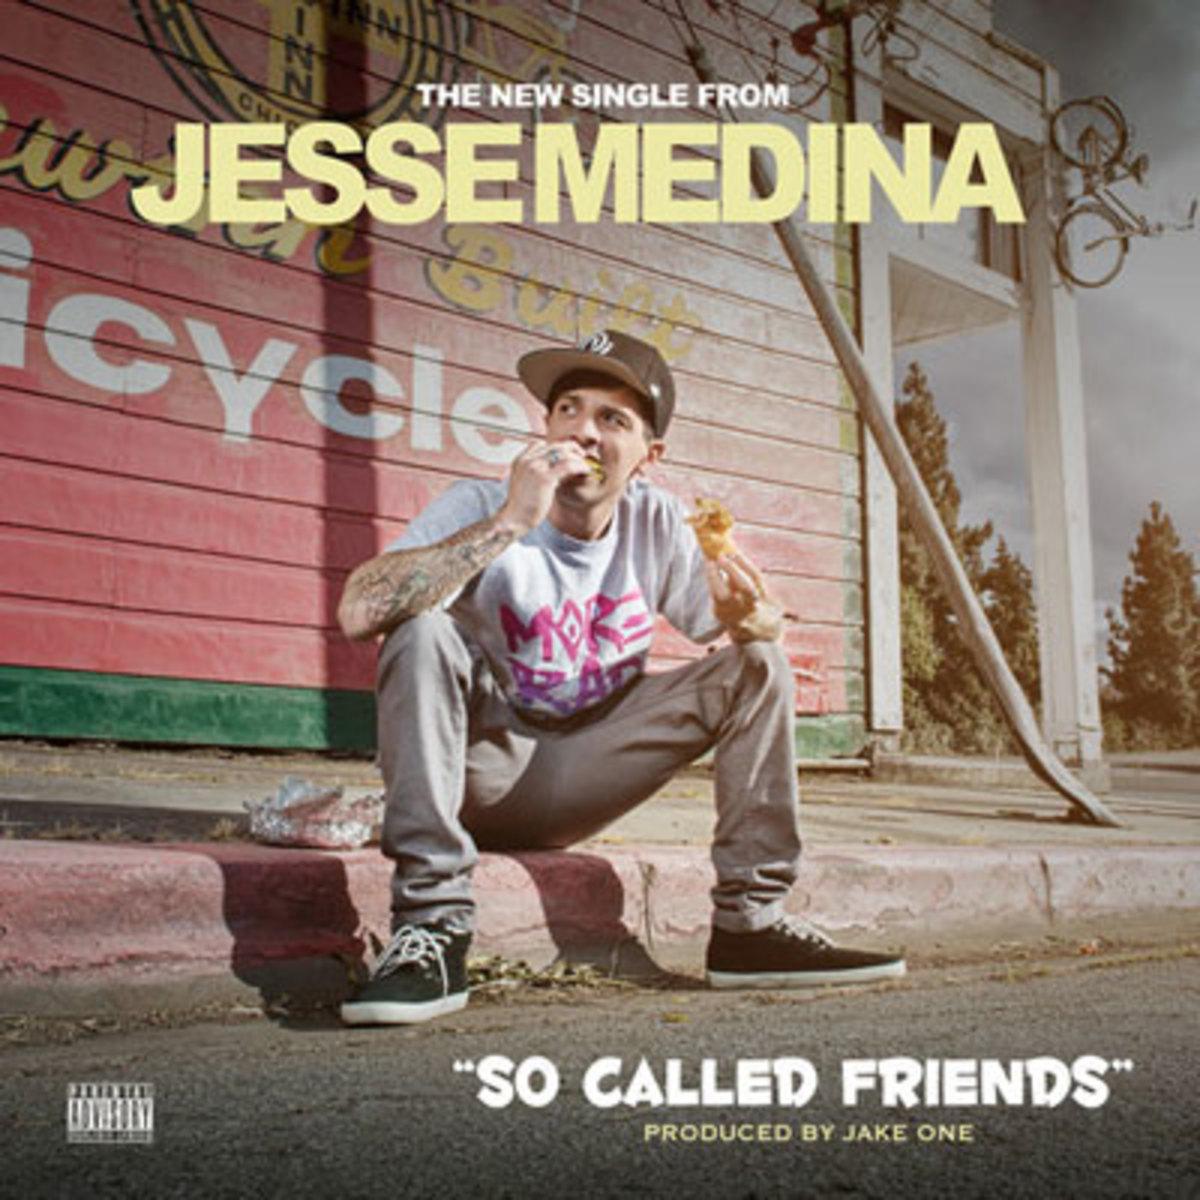 jessemedina-socalledfriends.jpg